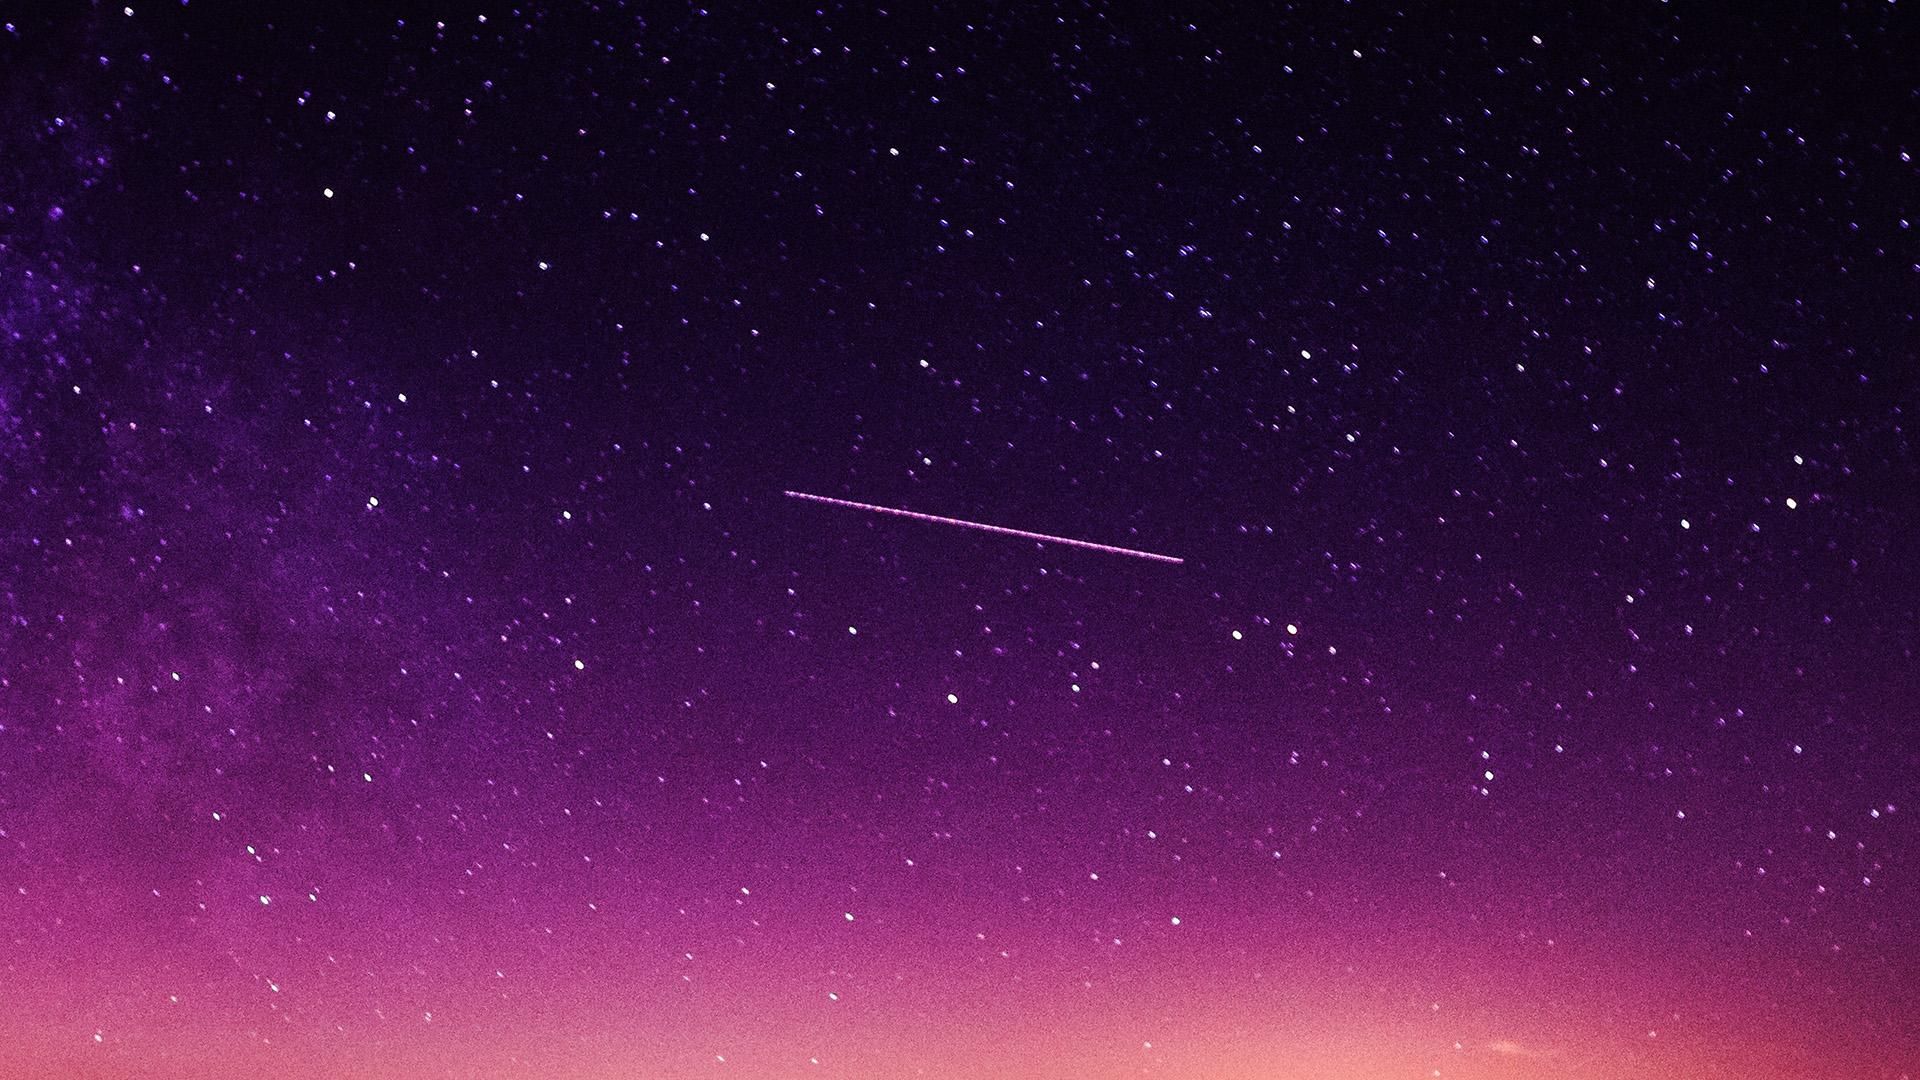 4k Fall Wallpaper For Phone Ne63 Star Galaxy Night Sky Mountain Purple Red Nature